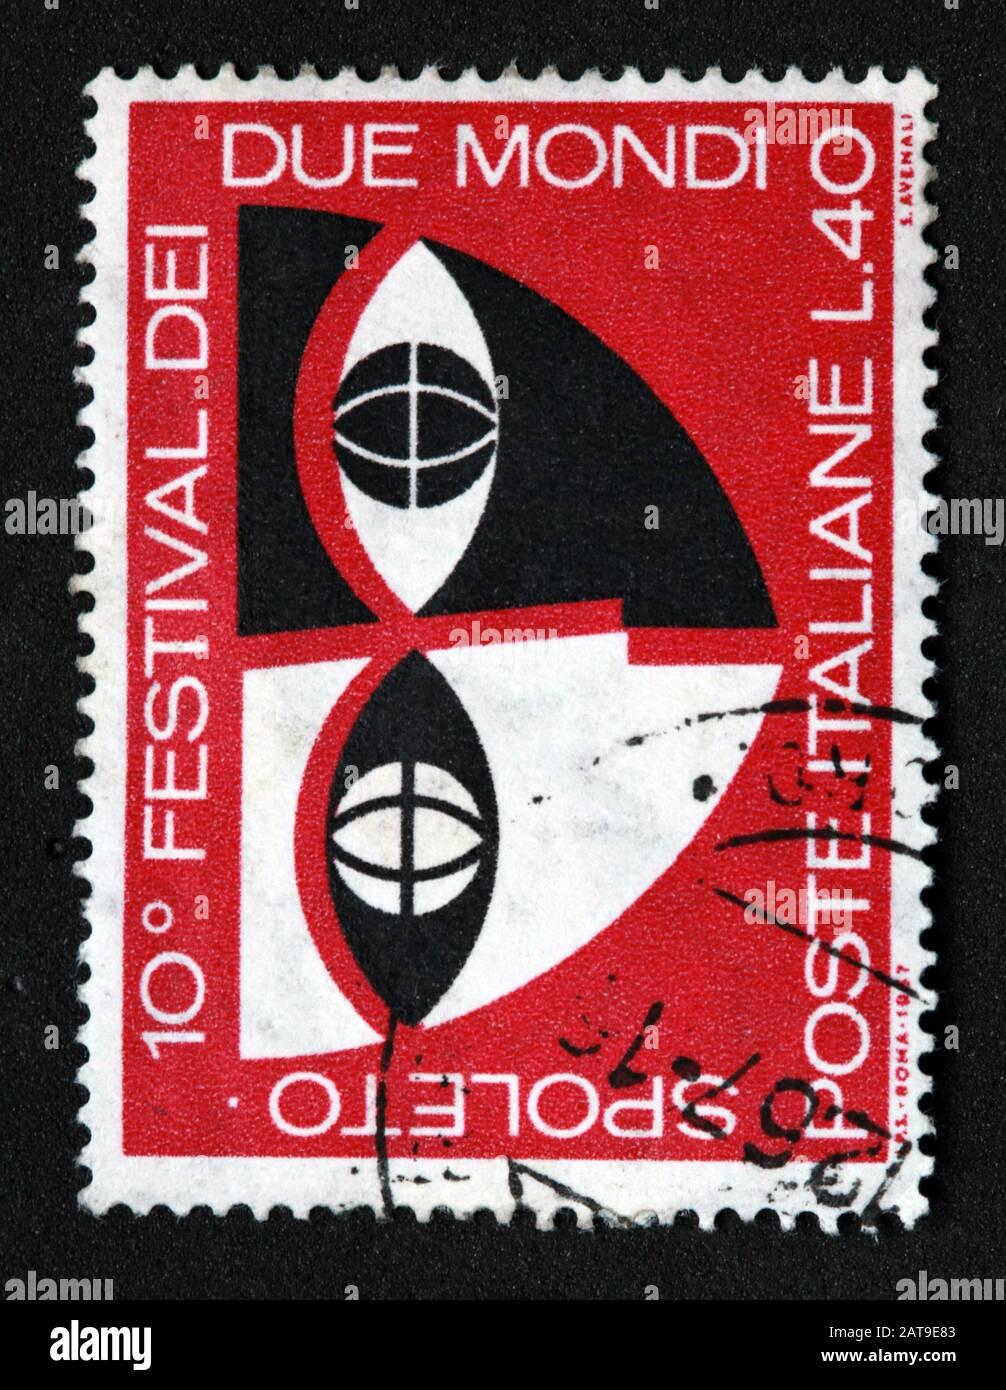 Hotpixuk,@Hotpixuk,GoTonySmith,stamp,postal,franked,frank,used stamps,used franked,used,franked stamp,from envelope,history,historic,old,Italy,Italian,Italia,Italy Stamp,italian stamp,franked Italian stamp,used Italian stamp,Italy stamp,Poste Italiane,L40,Due Mondi,0.40Lire,L.40